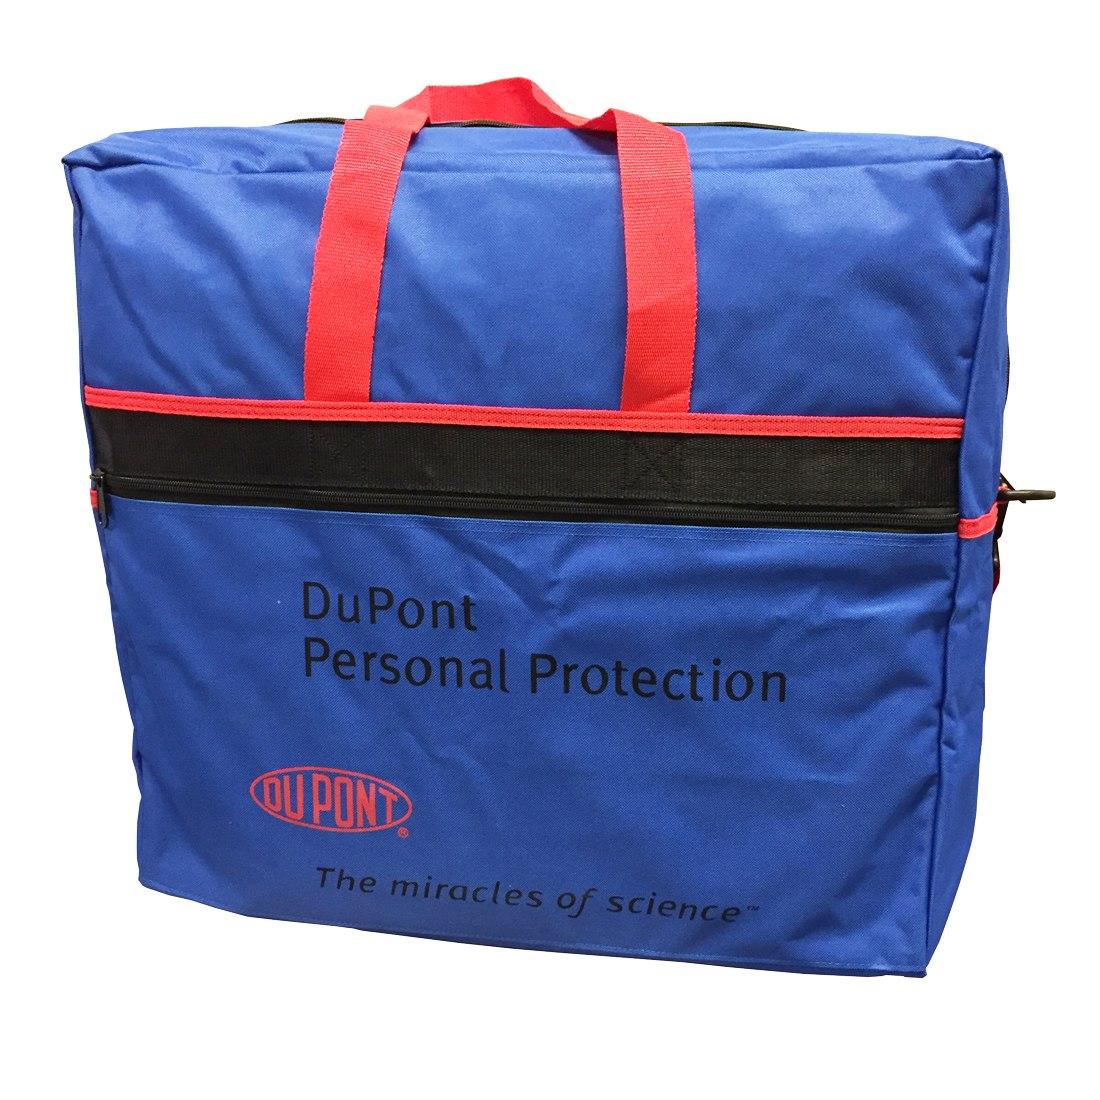 DuPont Tychem 10000 Level A Suit Storage Bag image